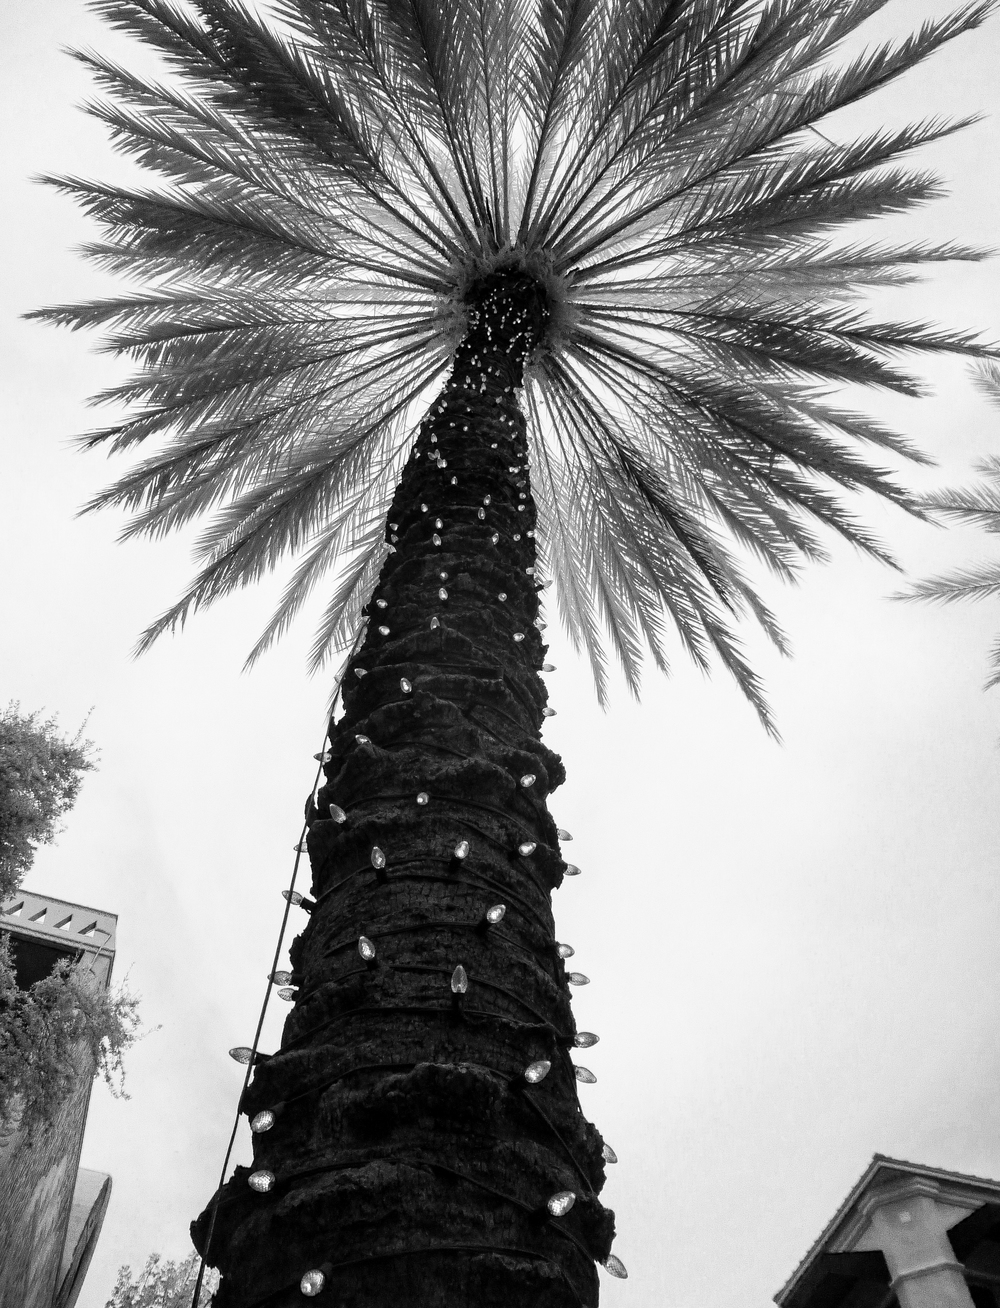 Palm Tree In Lights (1 of 1).jpg